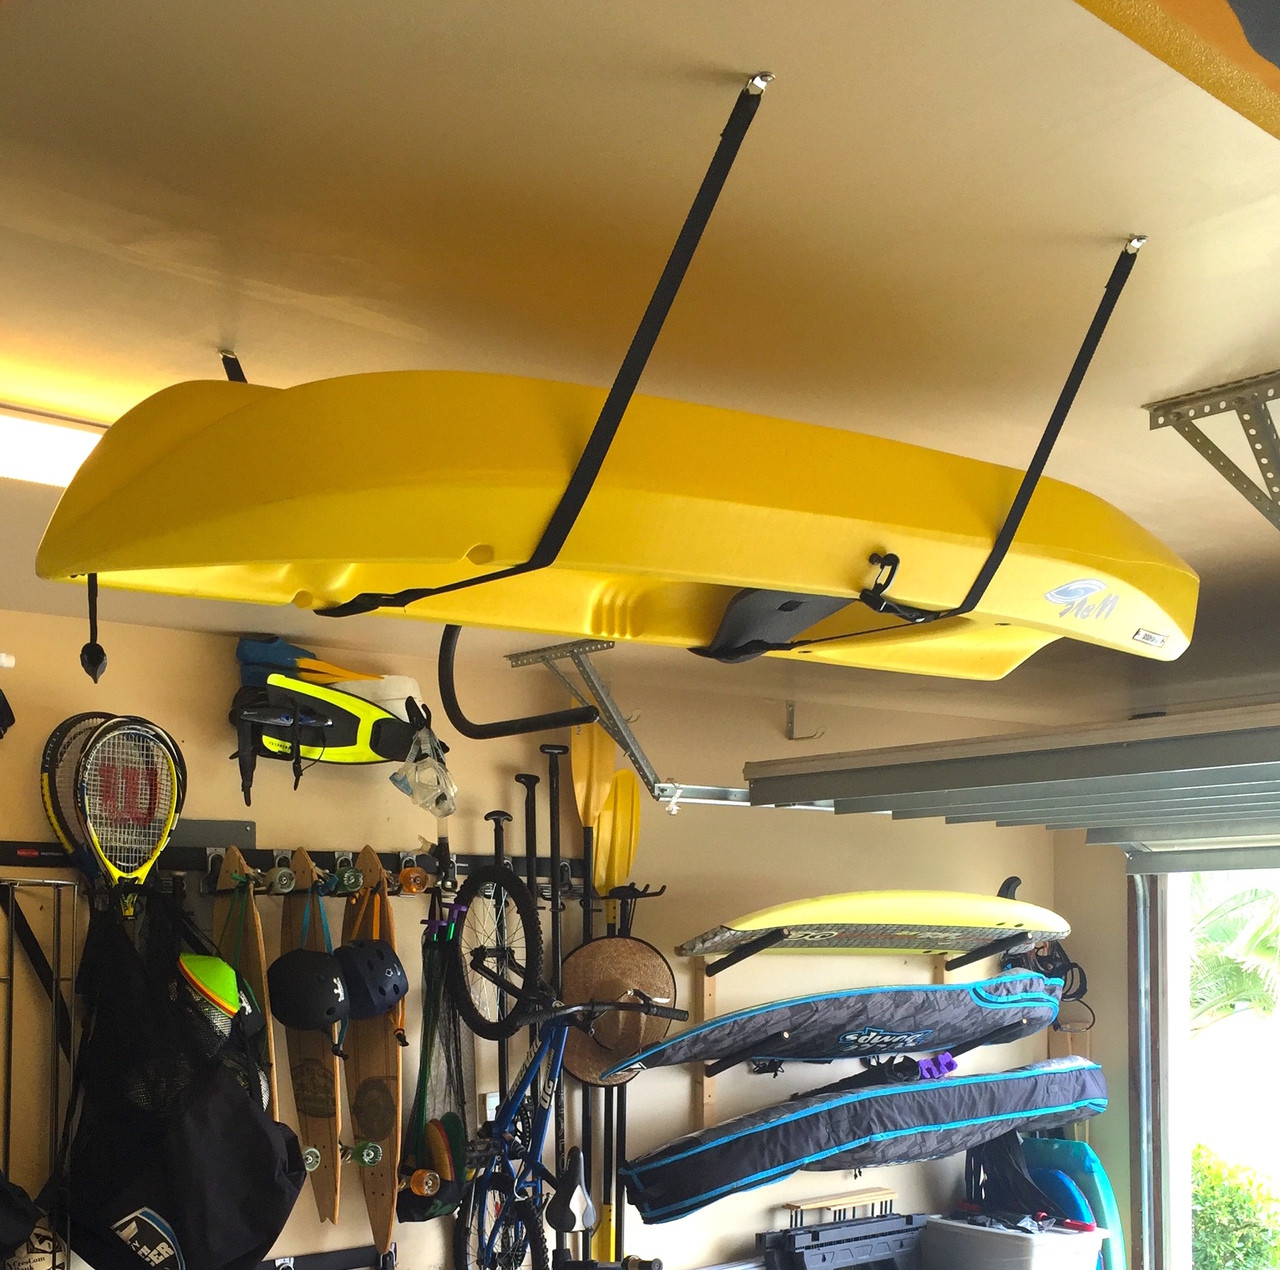 Superieur Home Garage Storage For Whitewater Kayaks